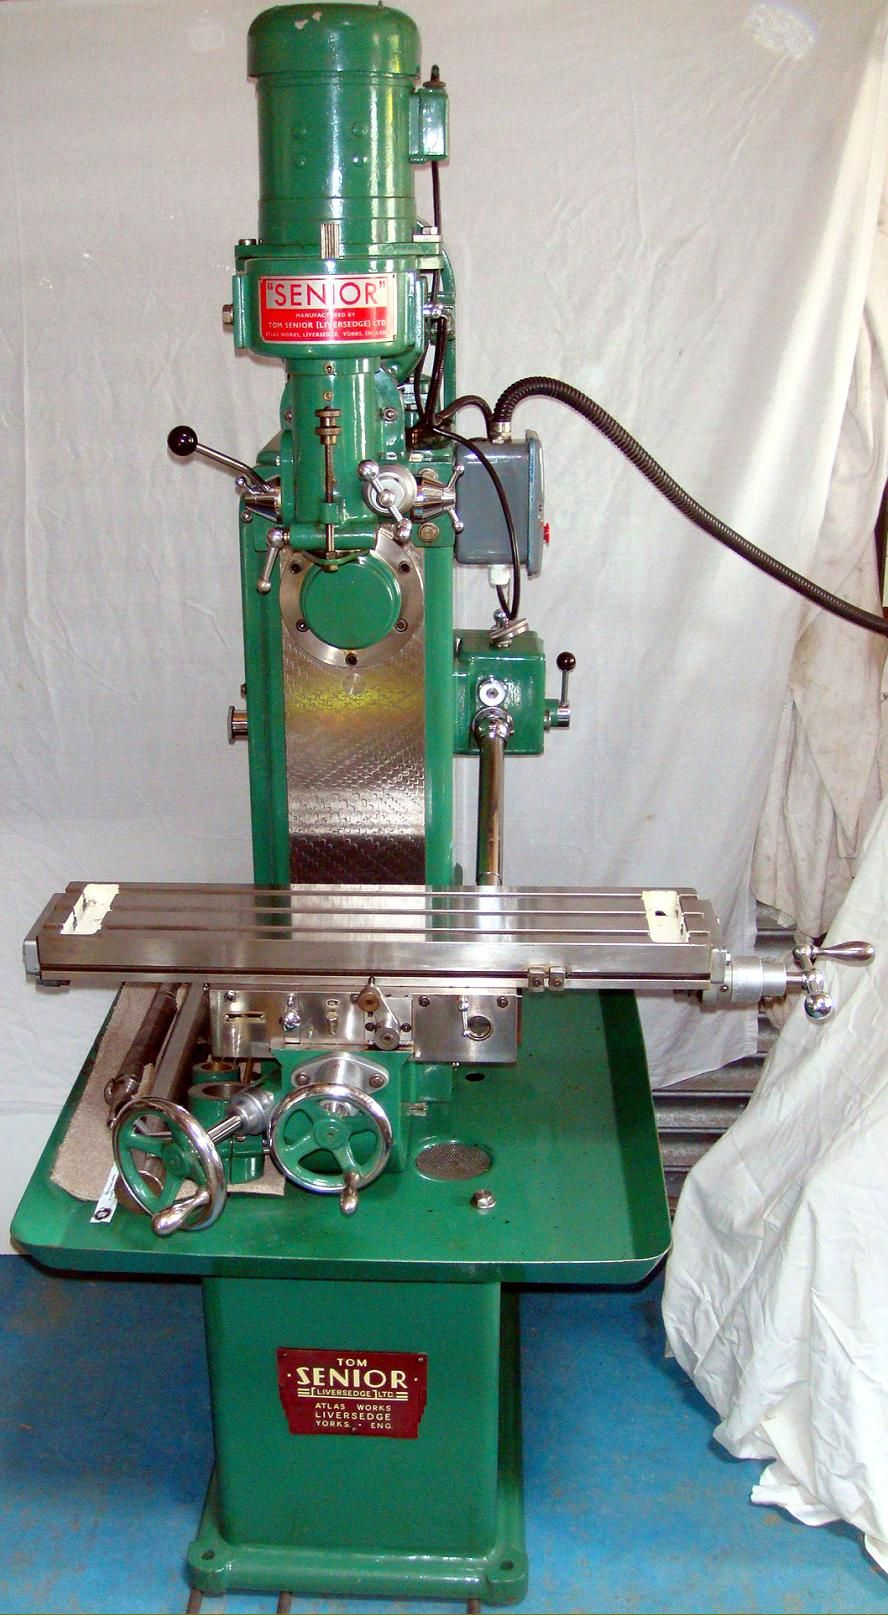 Tom Senior Milling Machine Google Search Machining